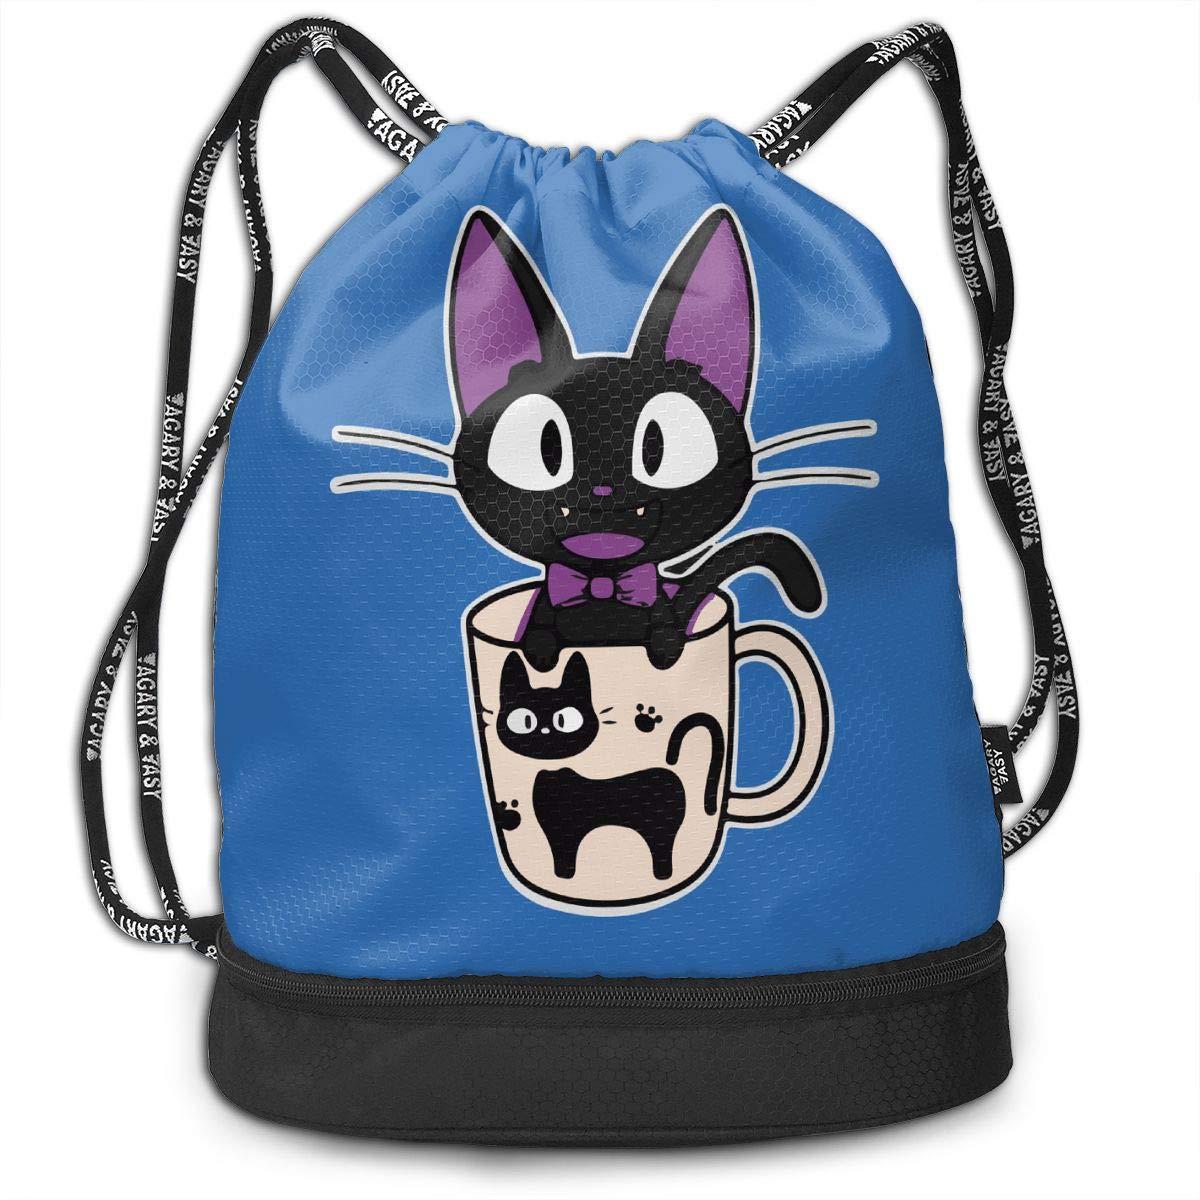 Its Me Men /& Women Drawstring Pack Beam Mouth School Travel Backpack Rucksack Shoulder Bags Hey